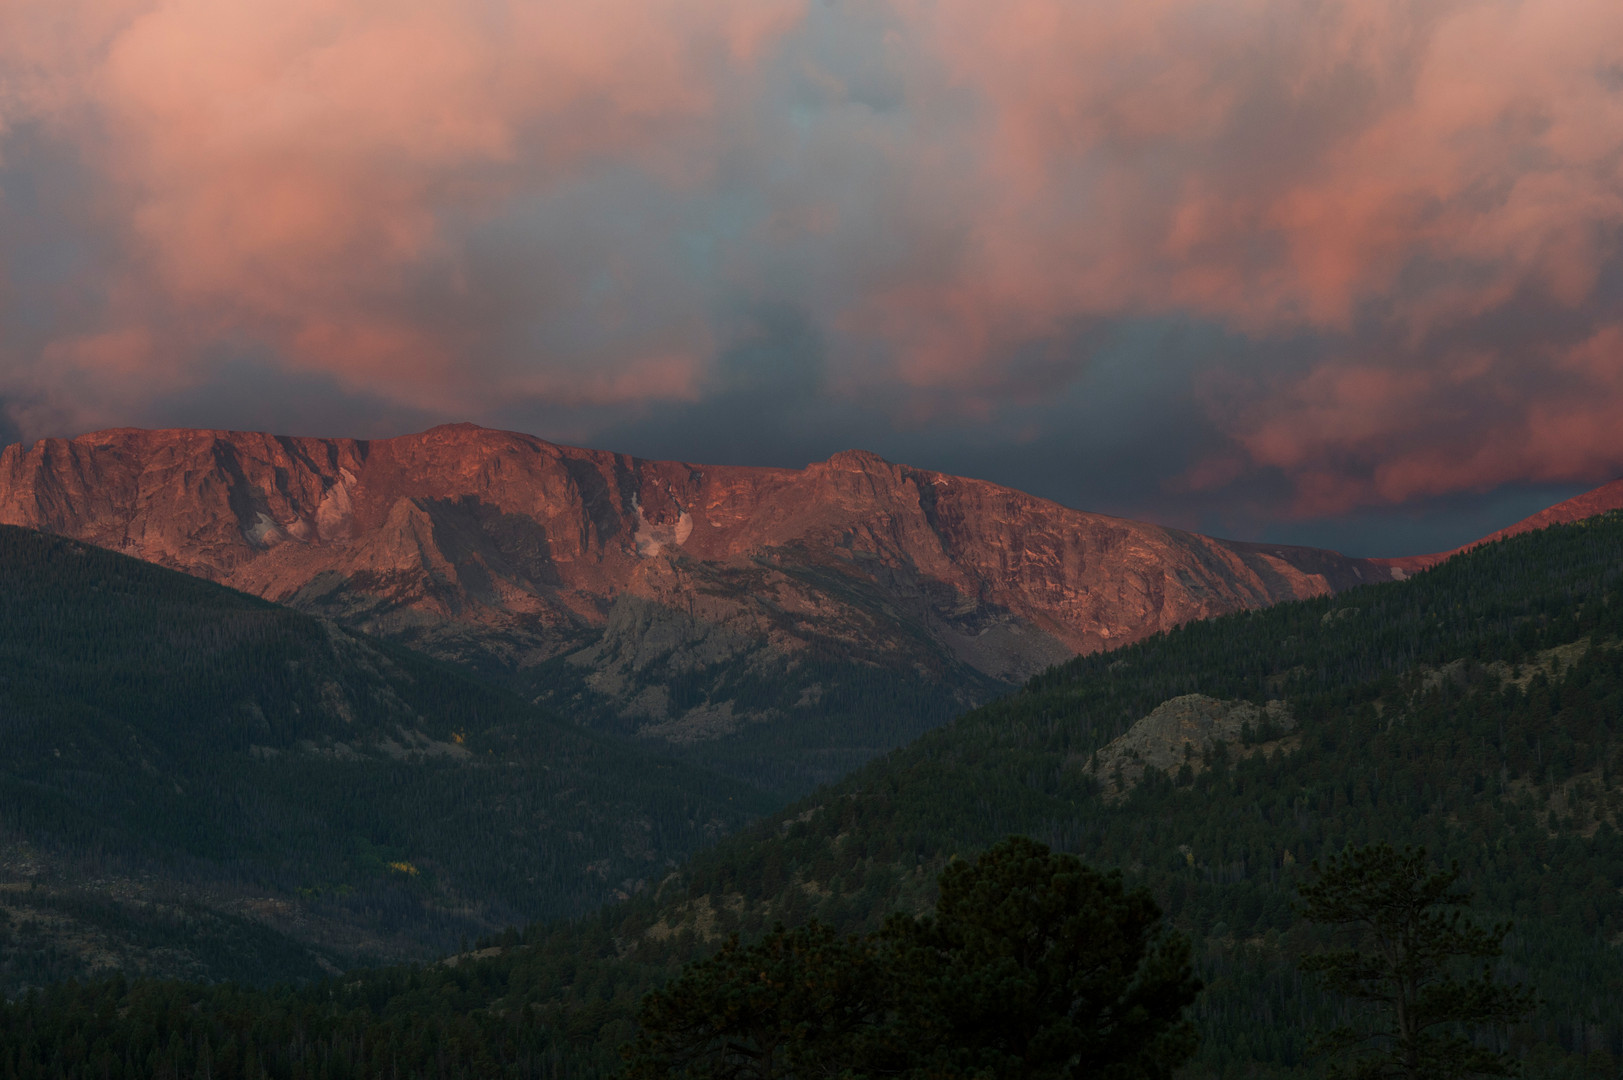 The sun rises over the ridge above Moraine Park in Rocky Mountain National Park Thursday, September 17, 2015.